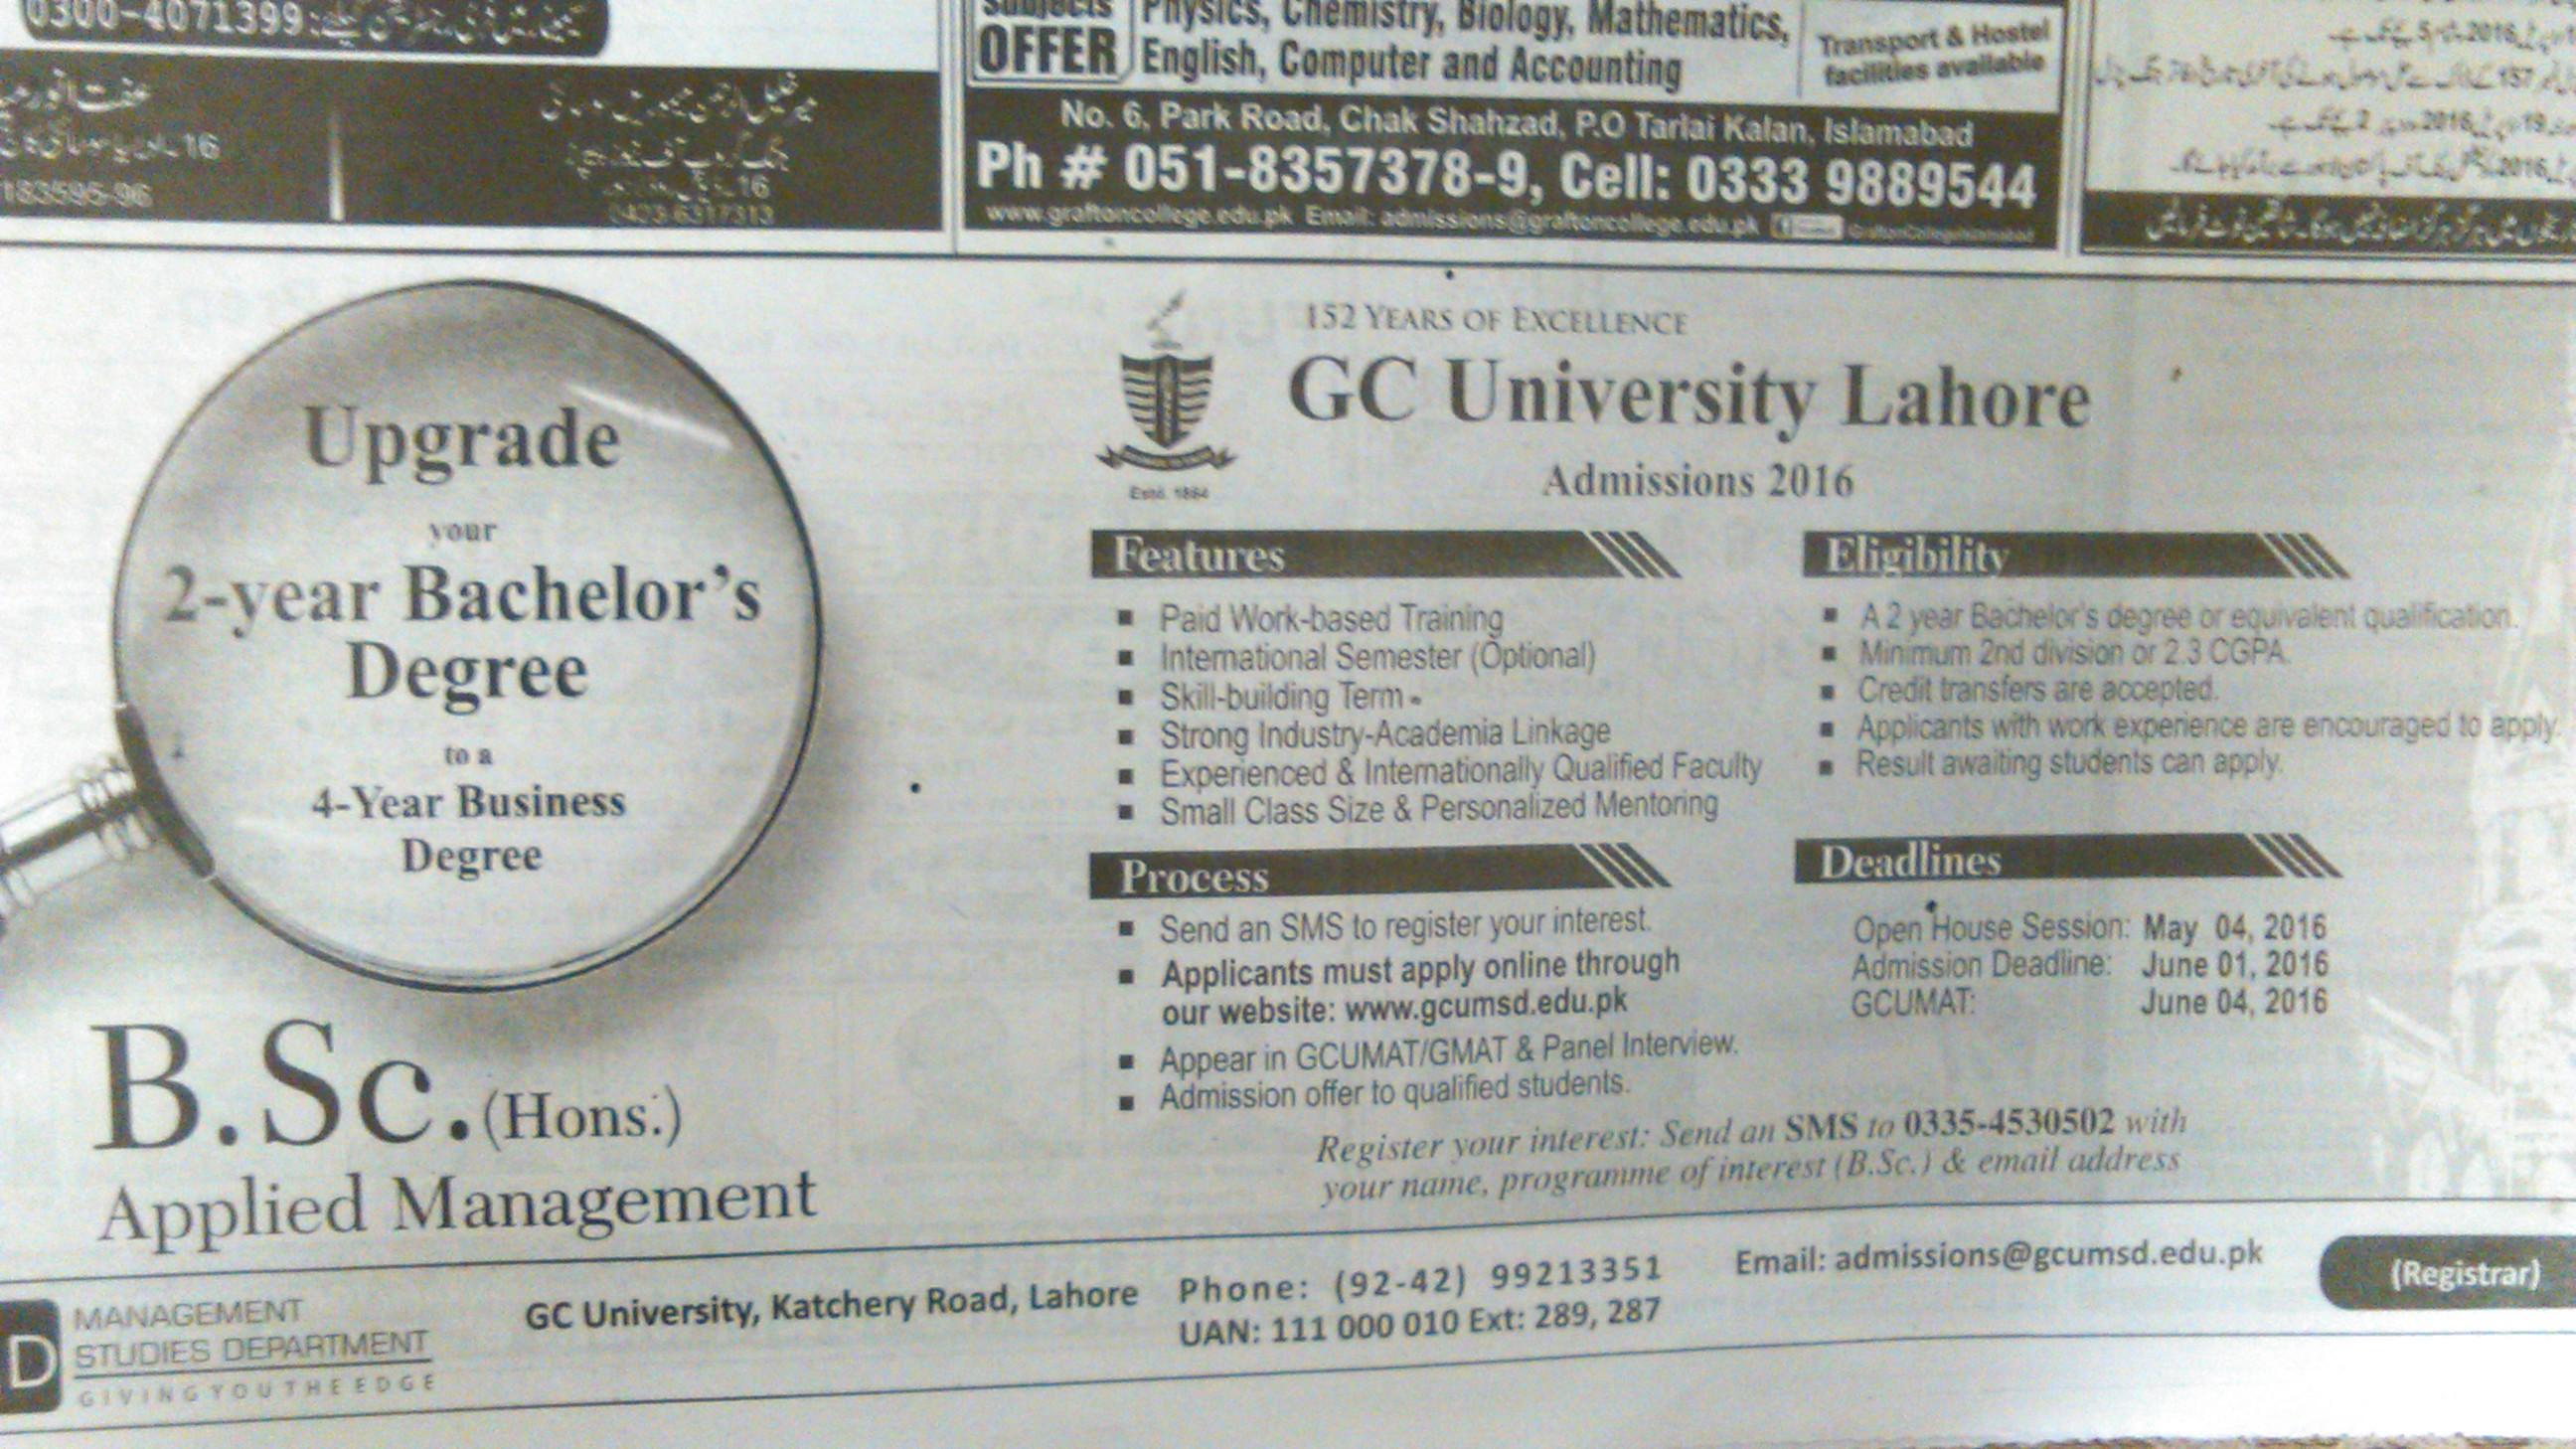 GC University Lahore Admissions 2016